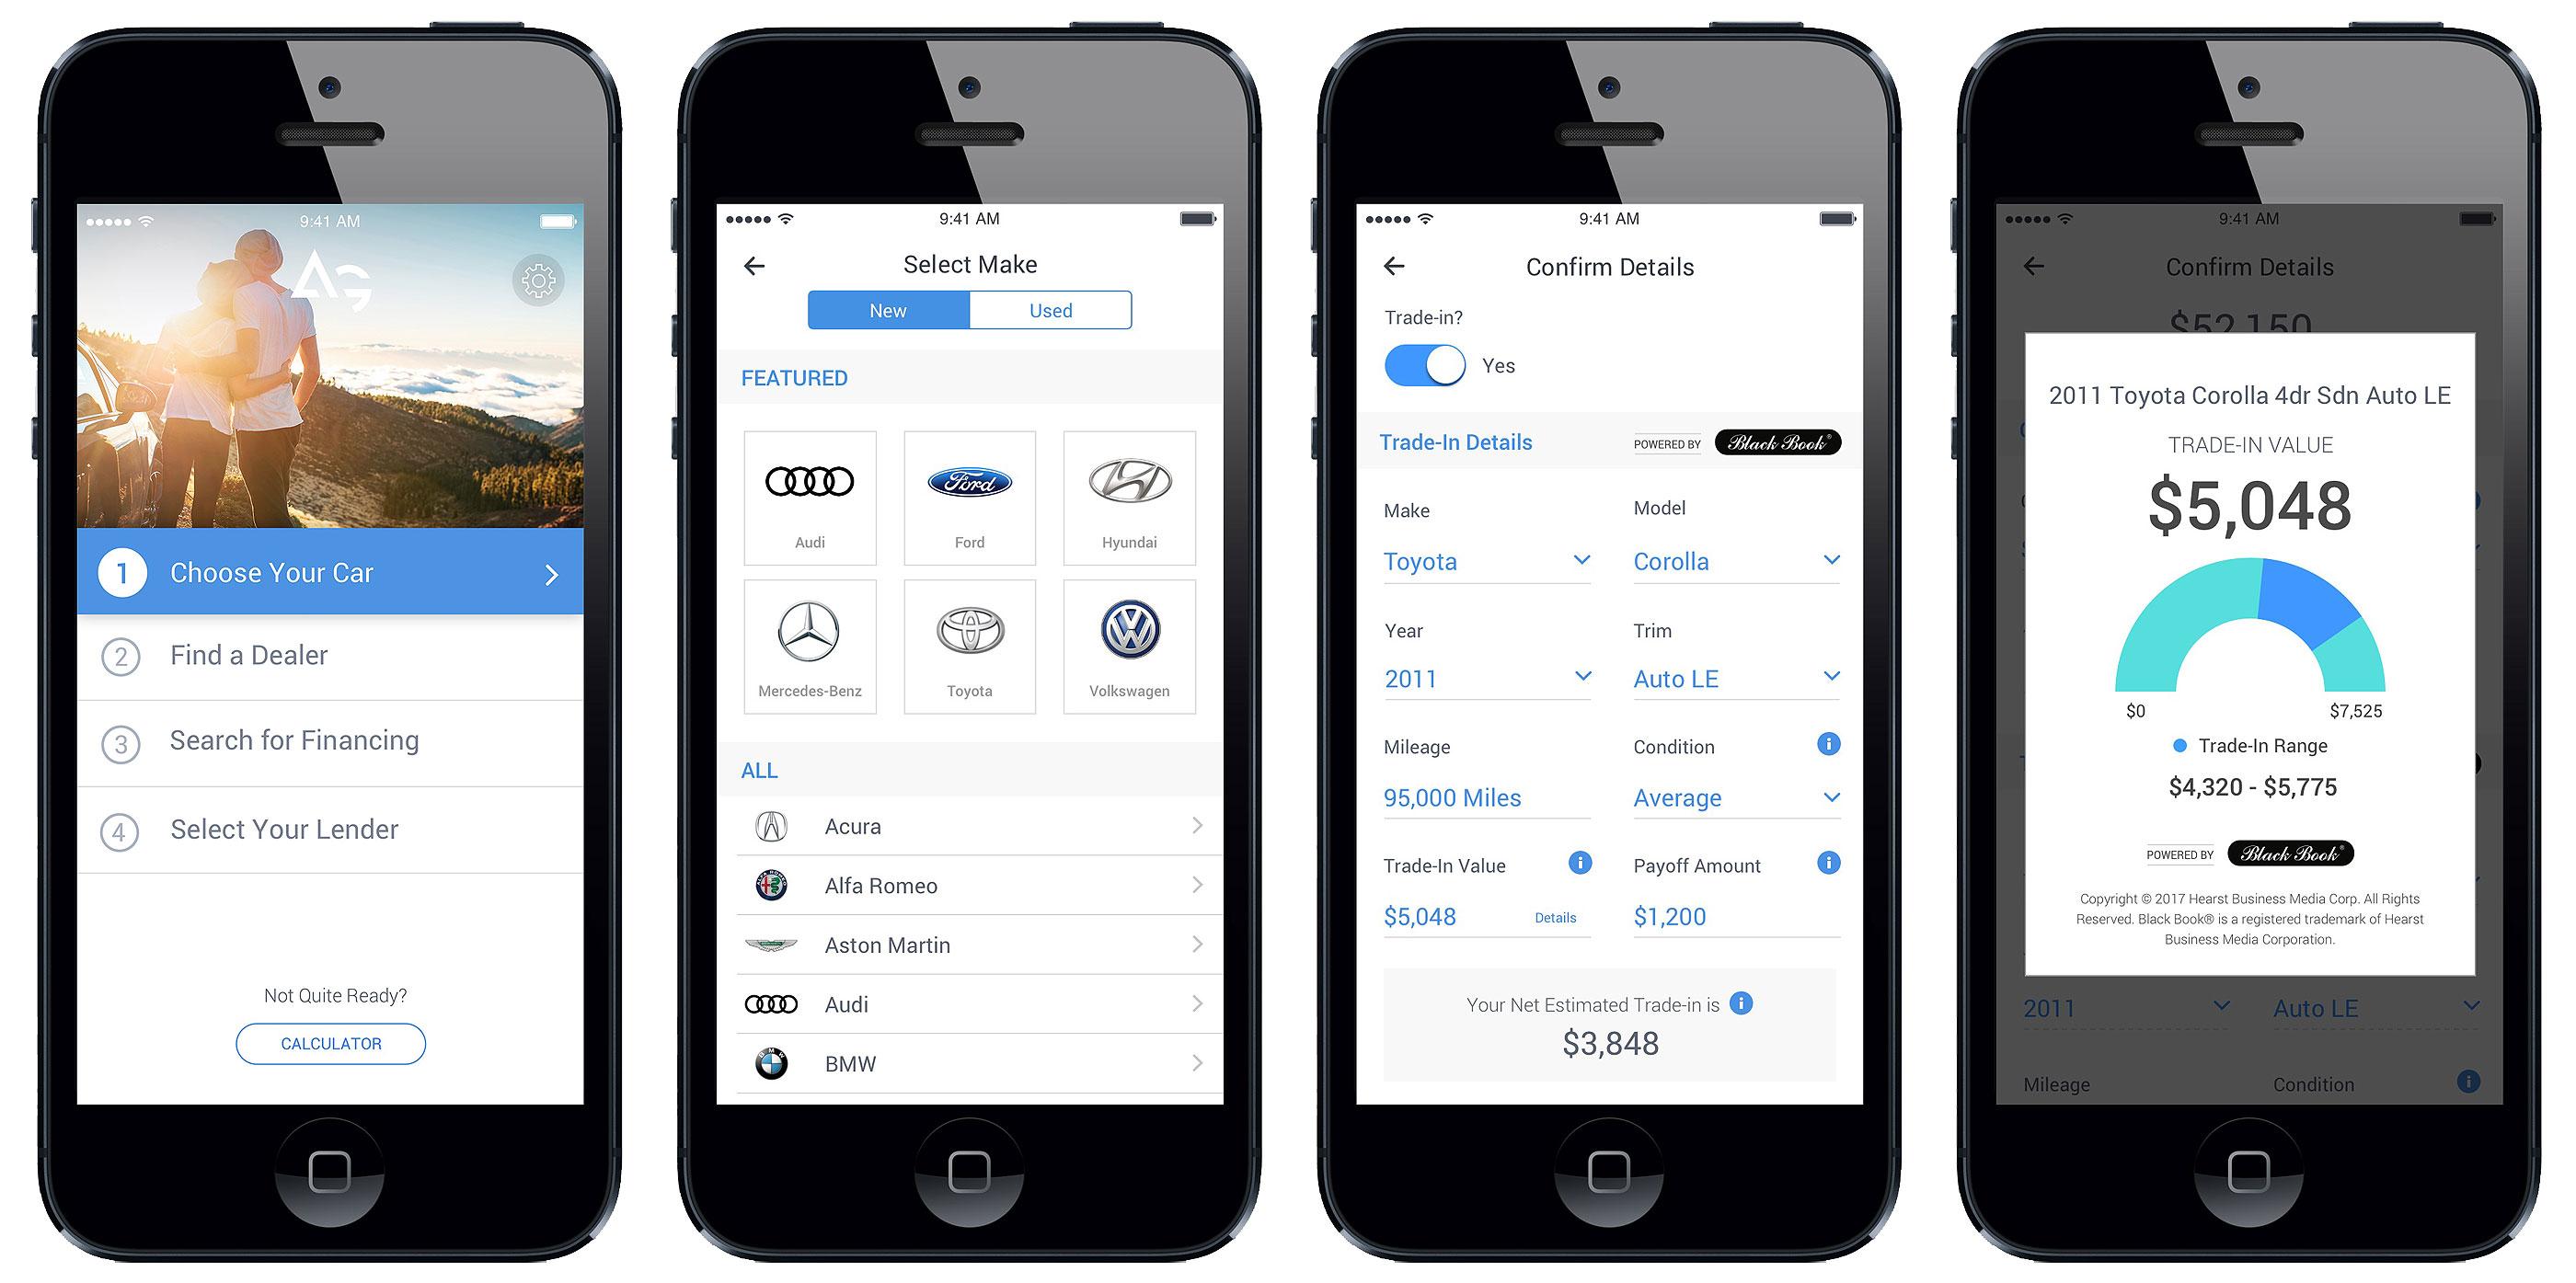 Black Book Car >> Autogravity Black Book Launch Digital Tool To Crunch Trade